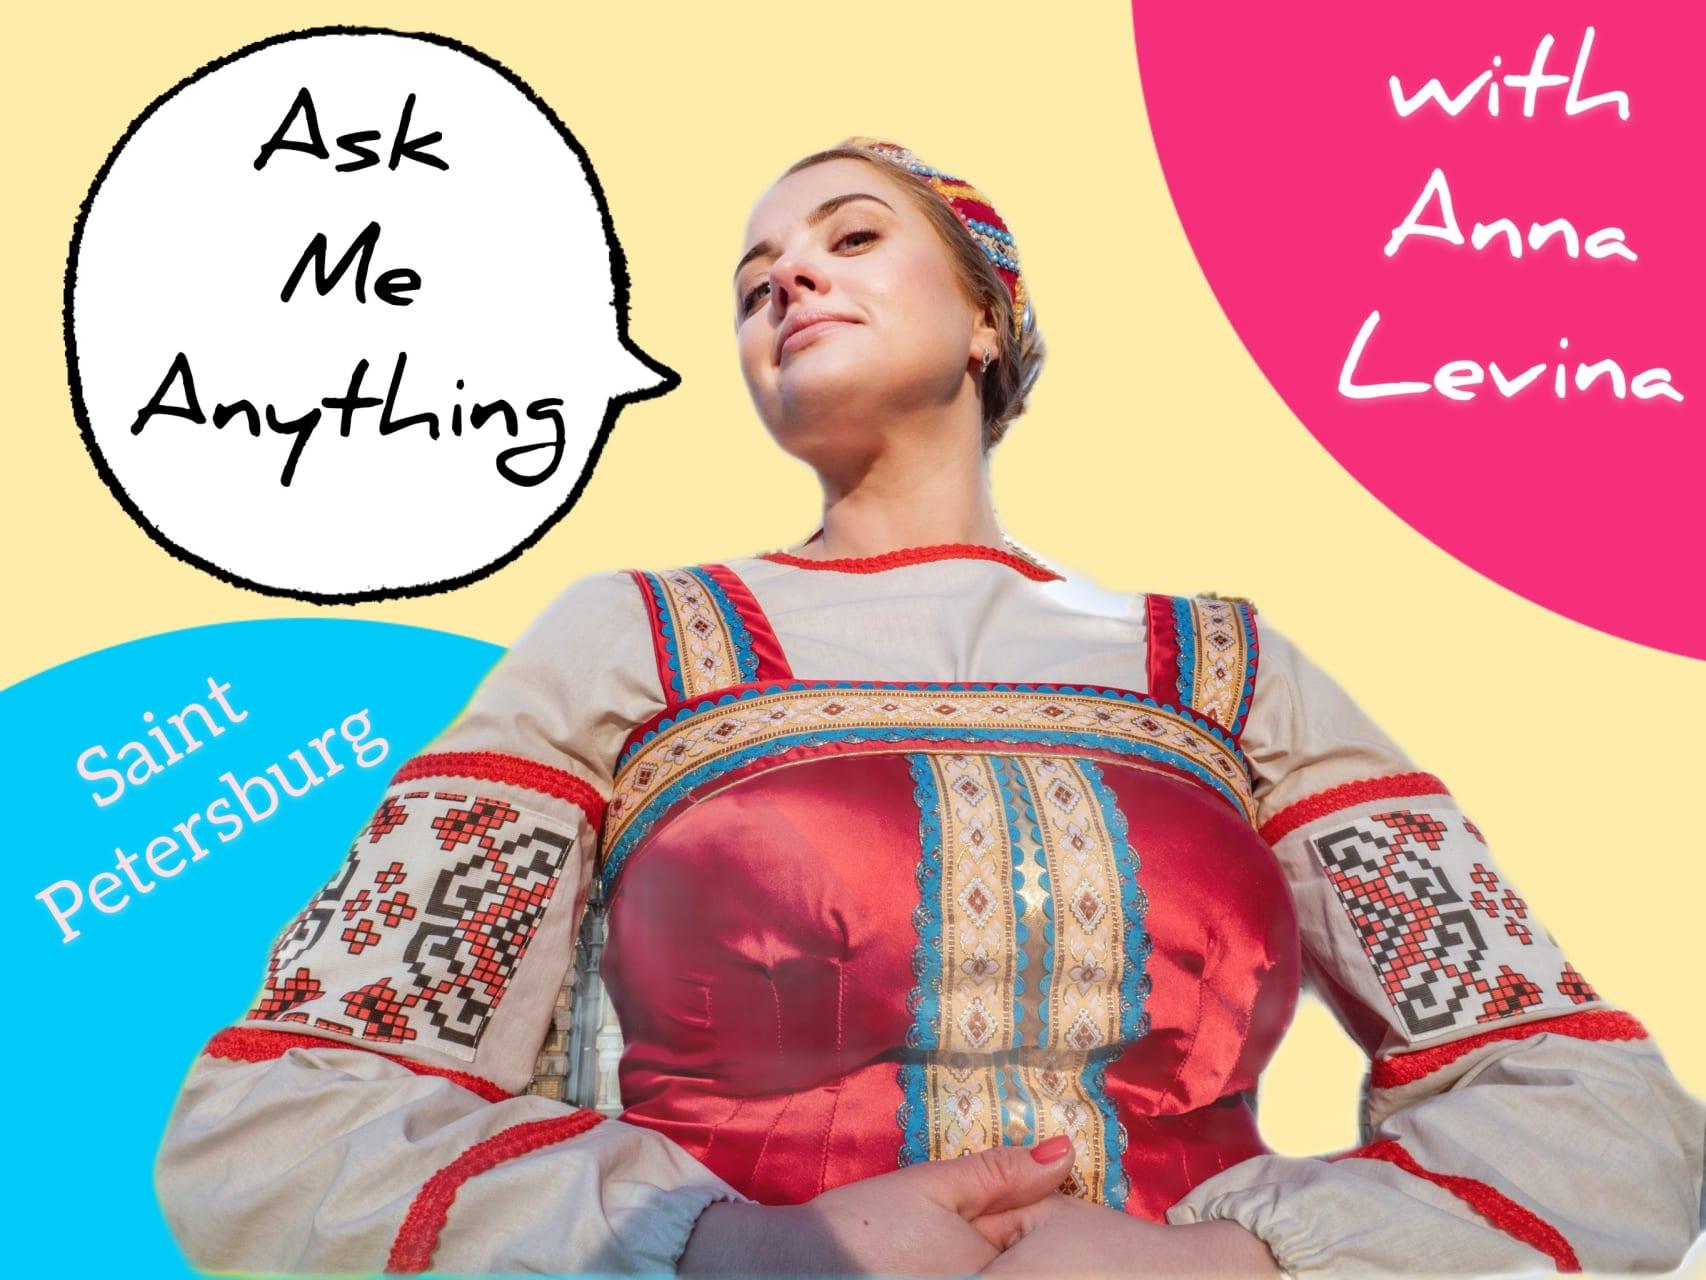 Saint Petersburg - Ask Me Anything: From Saint Petersburg with Love